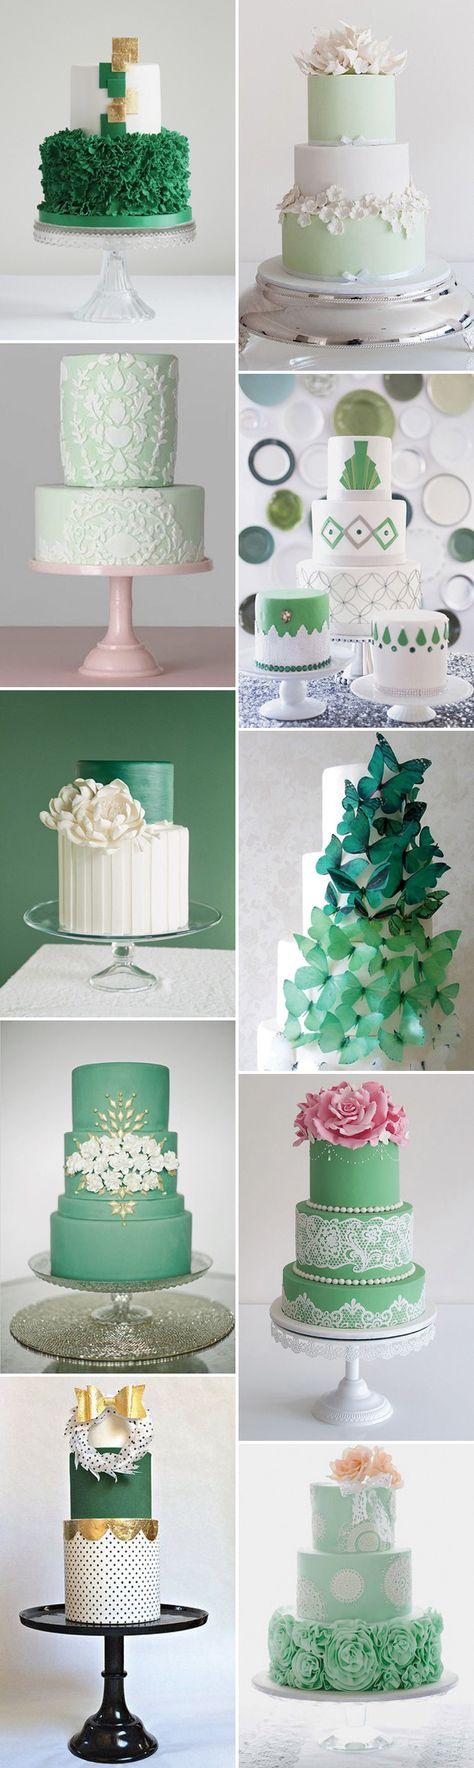 Gorgeous green wedding cake inspiration on www.onefabday.com